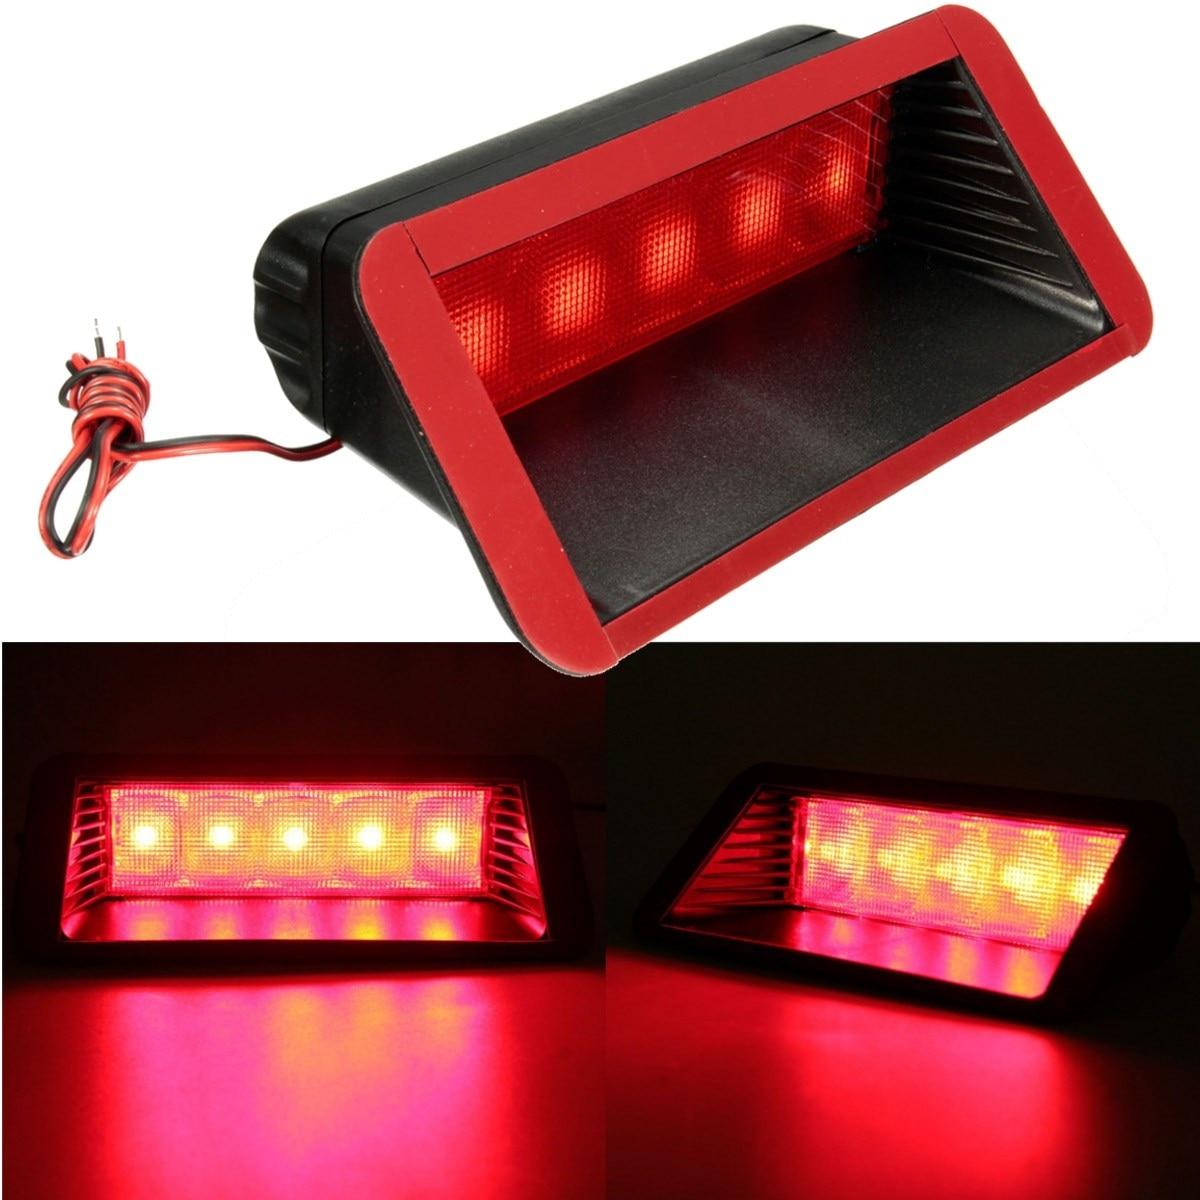 Universal 12V Car 5 LED Warning Rear Tail 3rd Third Brake Stop Fog Light High Mount Lamp Red